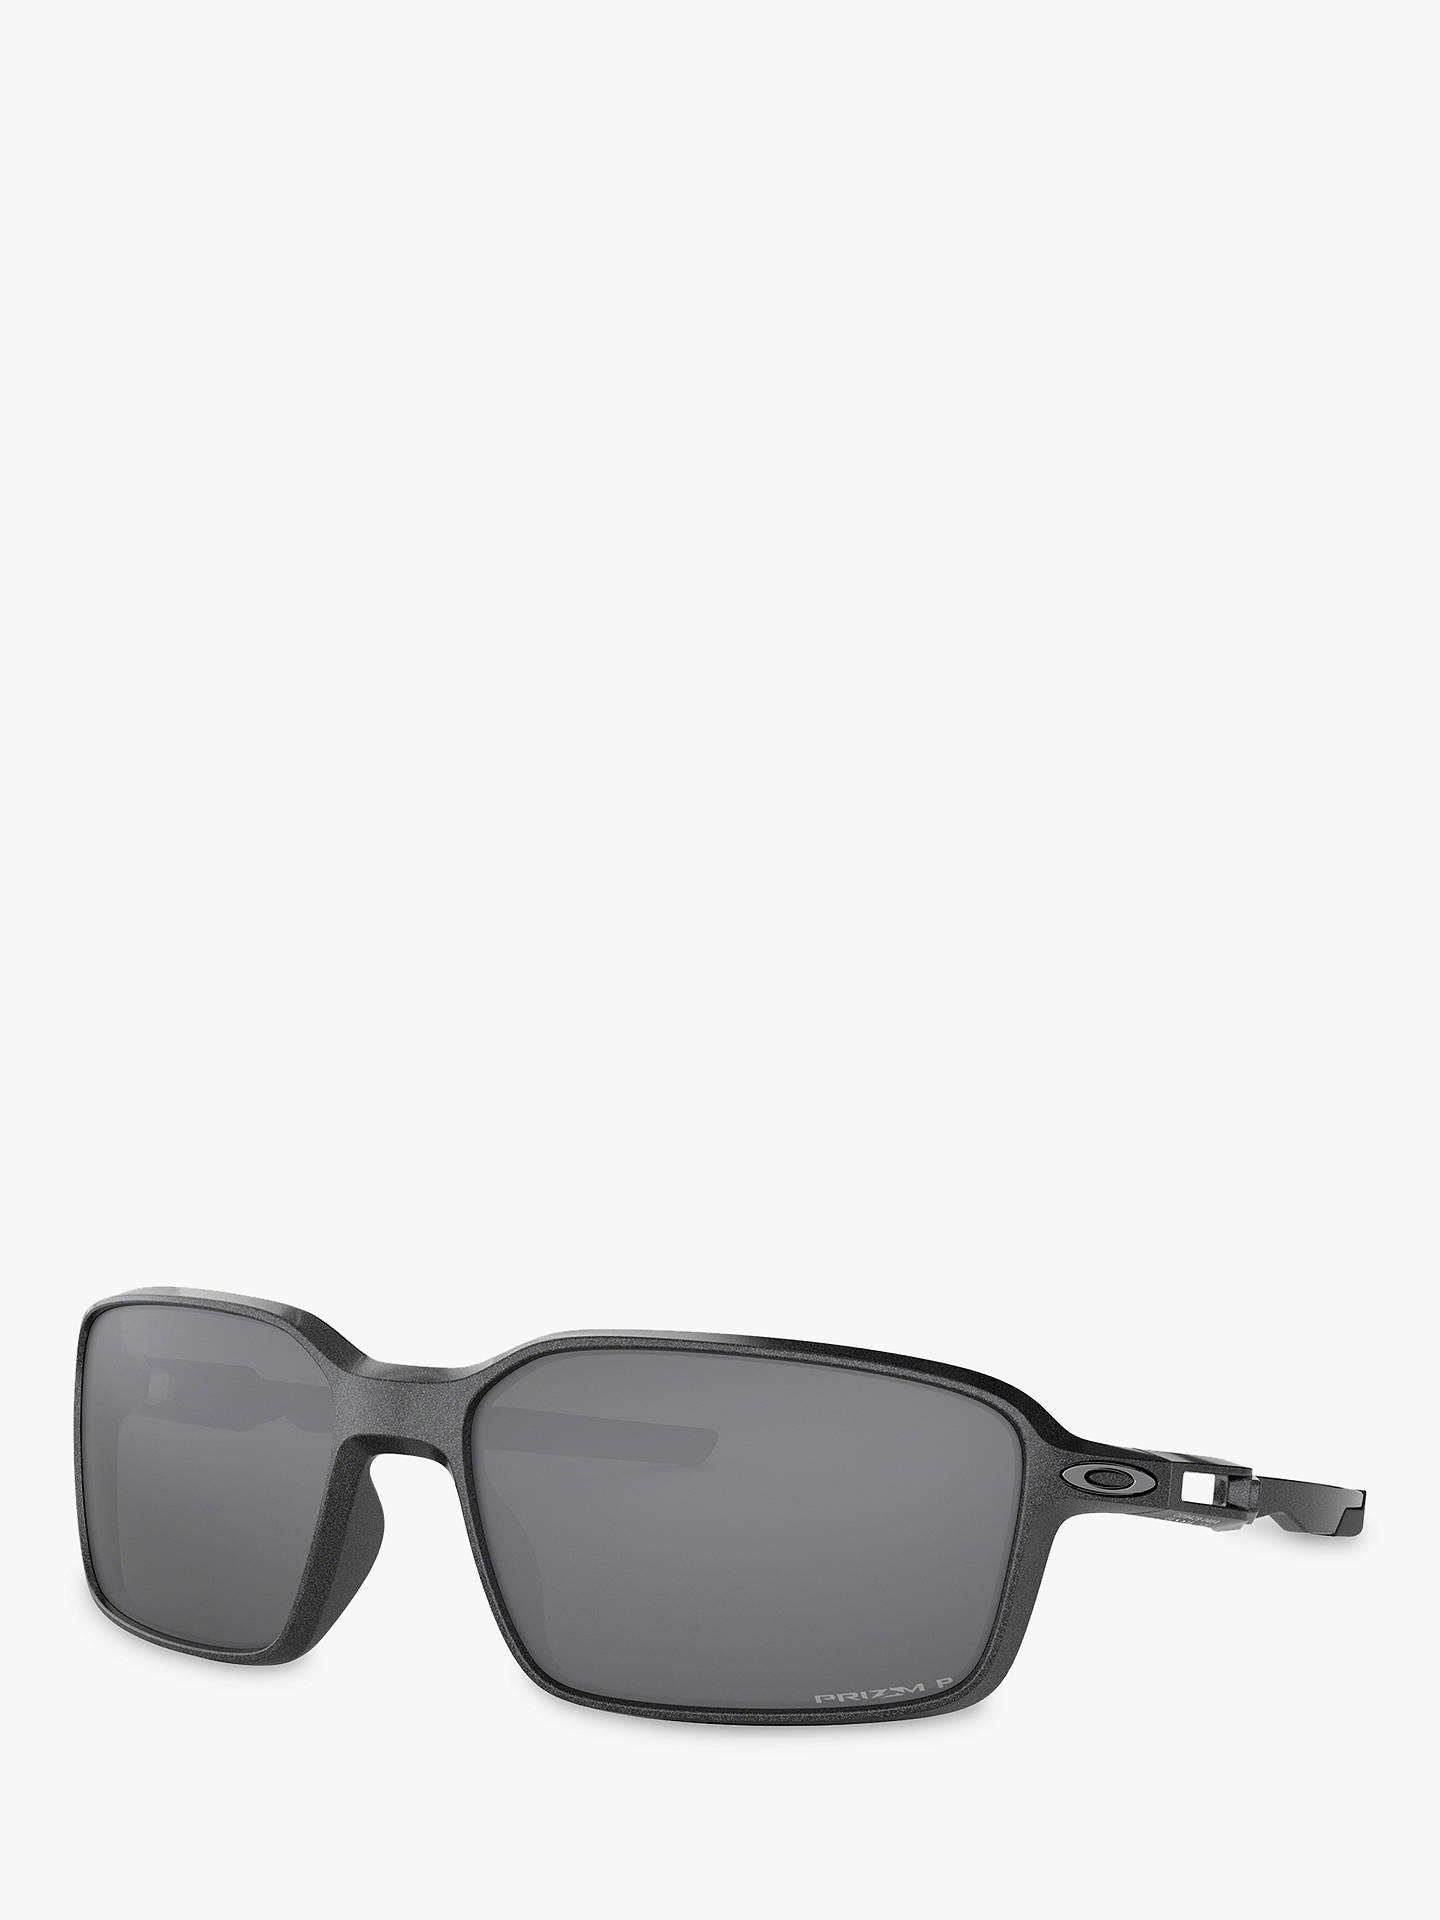 0e73e3a7428 Oakley OO9429 Men s Siphon Prizm Polarised Rectangular Sunglasses at ...